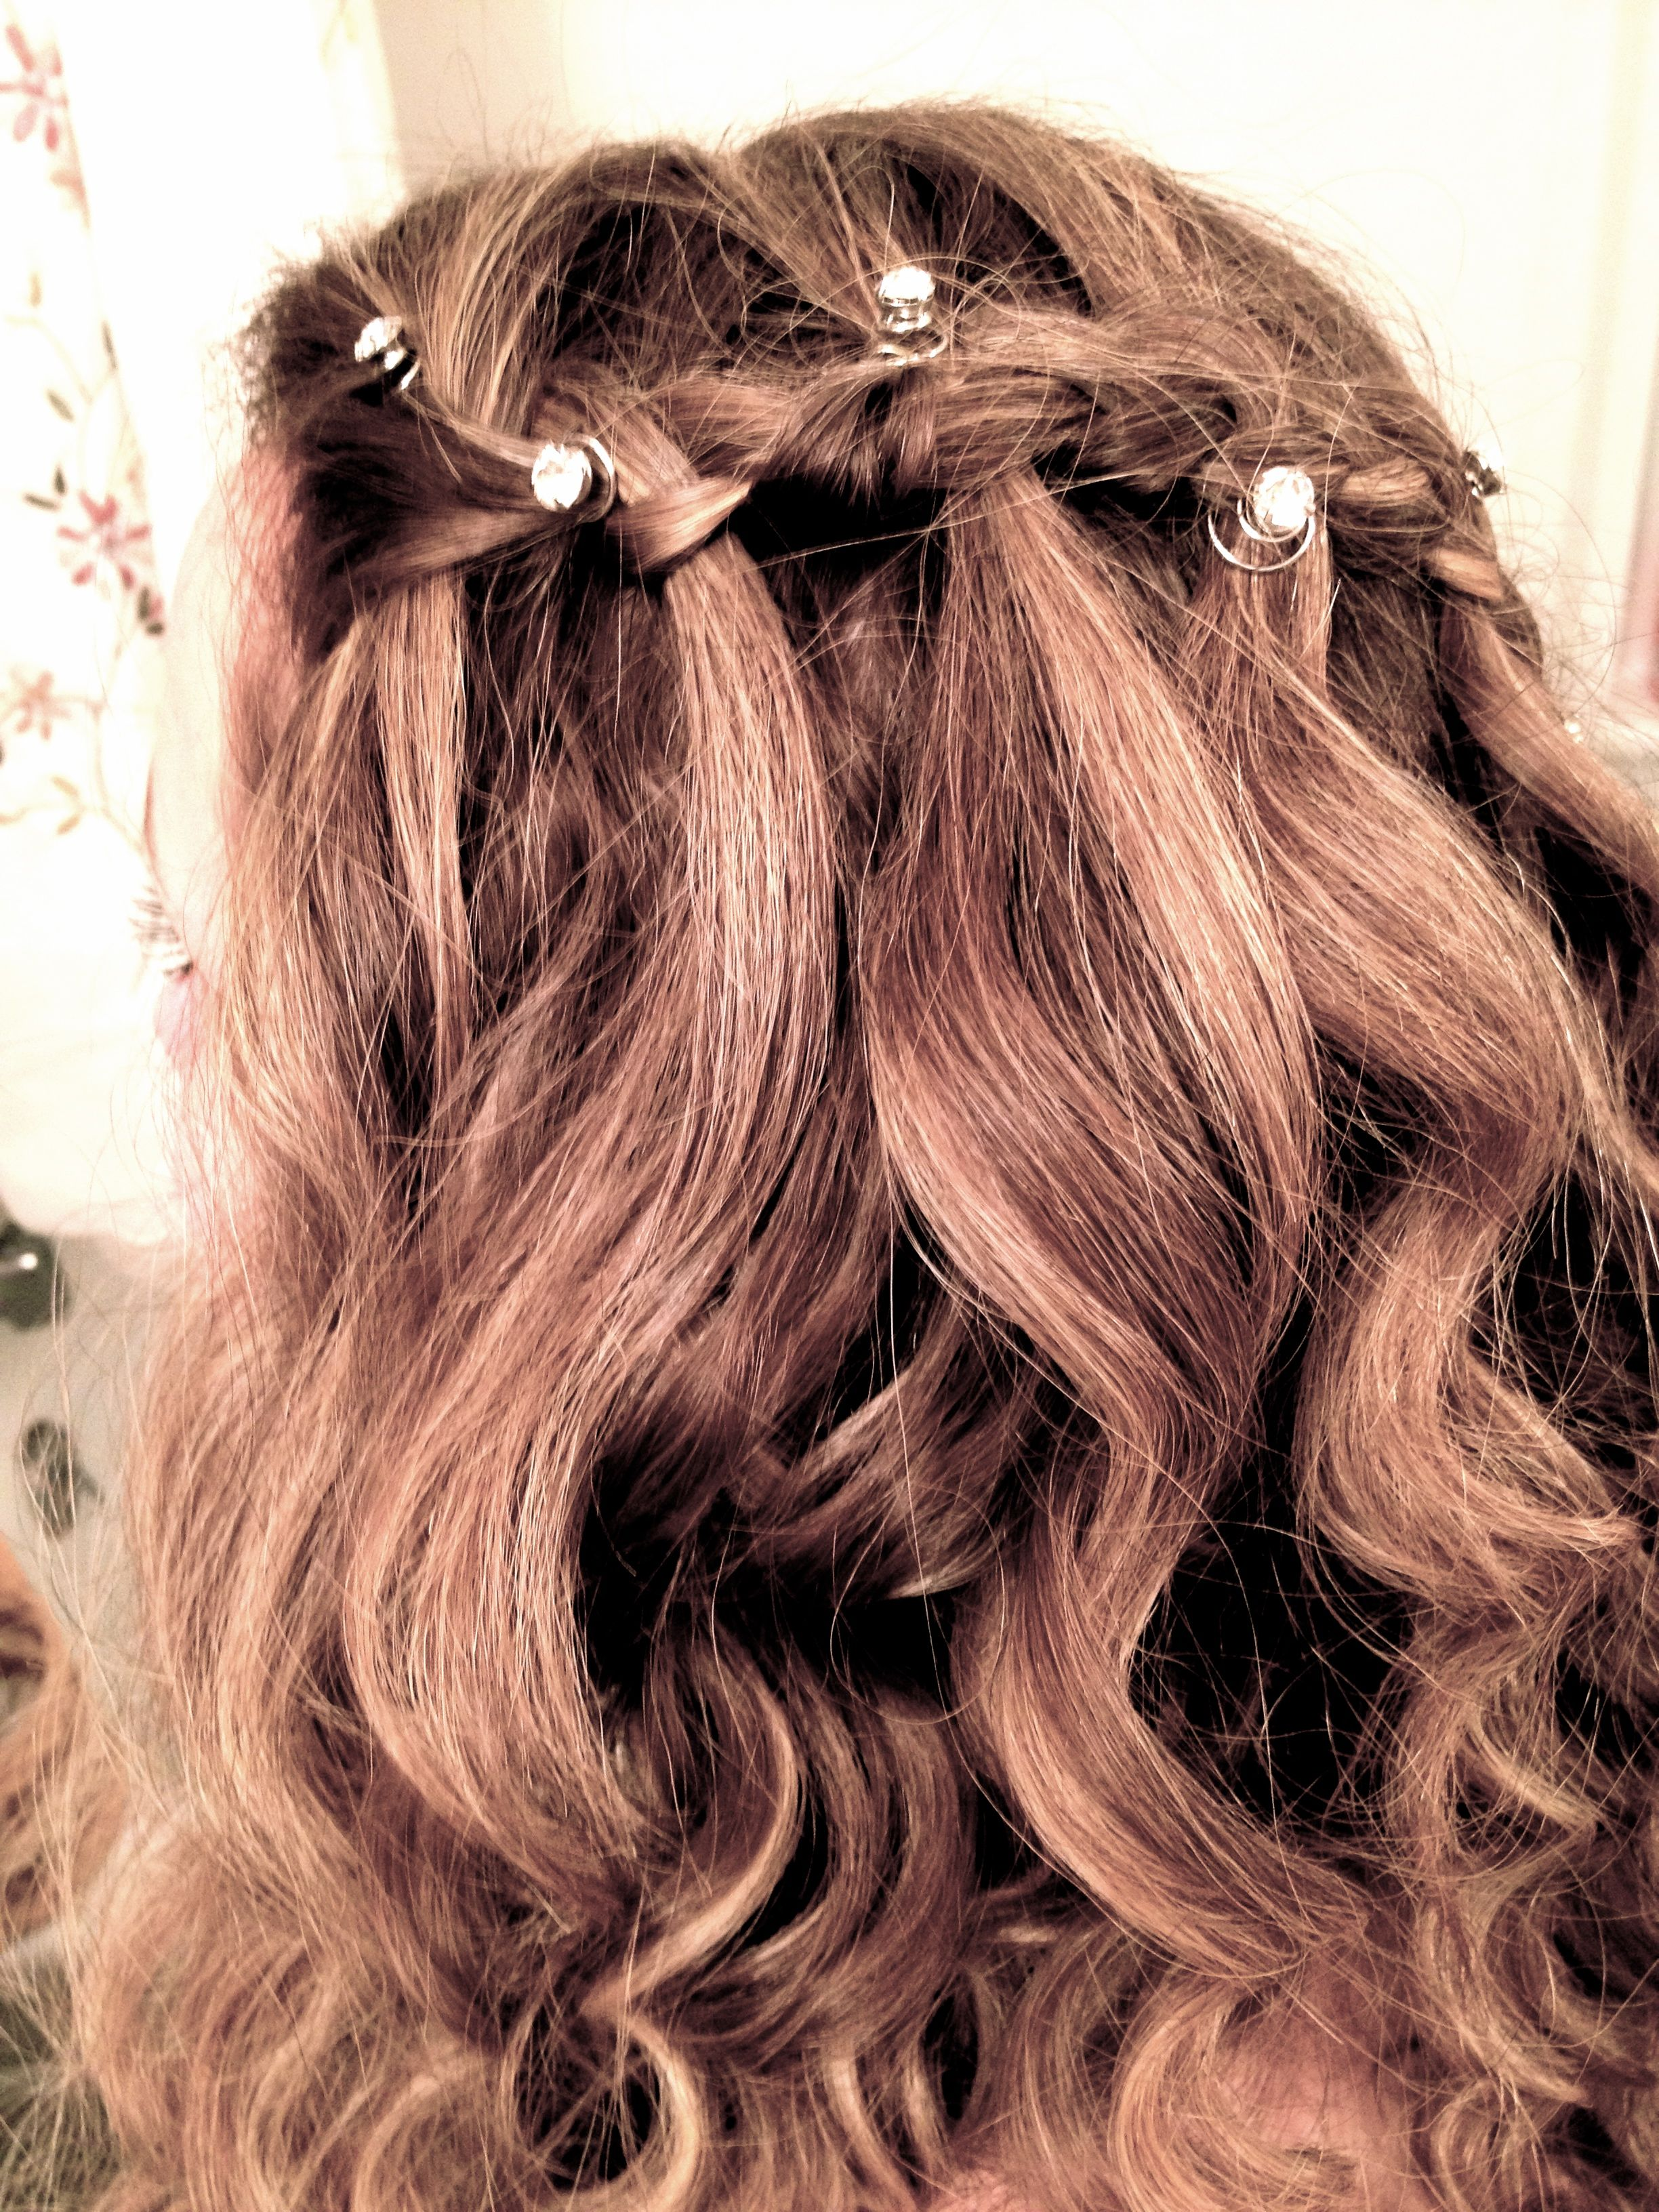 Waterfall braid. #waterfall #braid #prom #hair #pretty ...